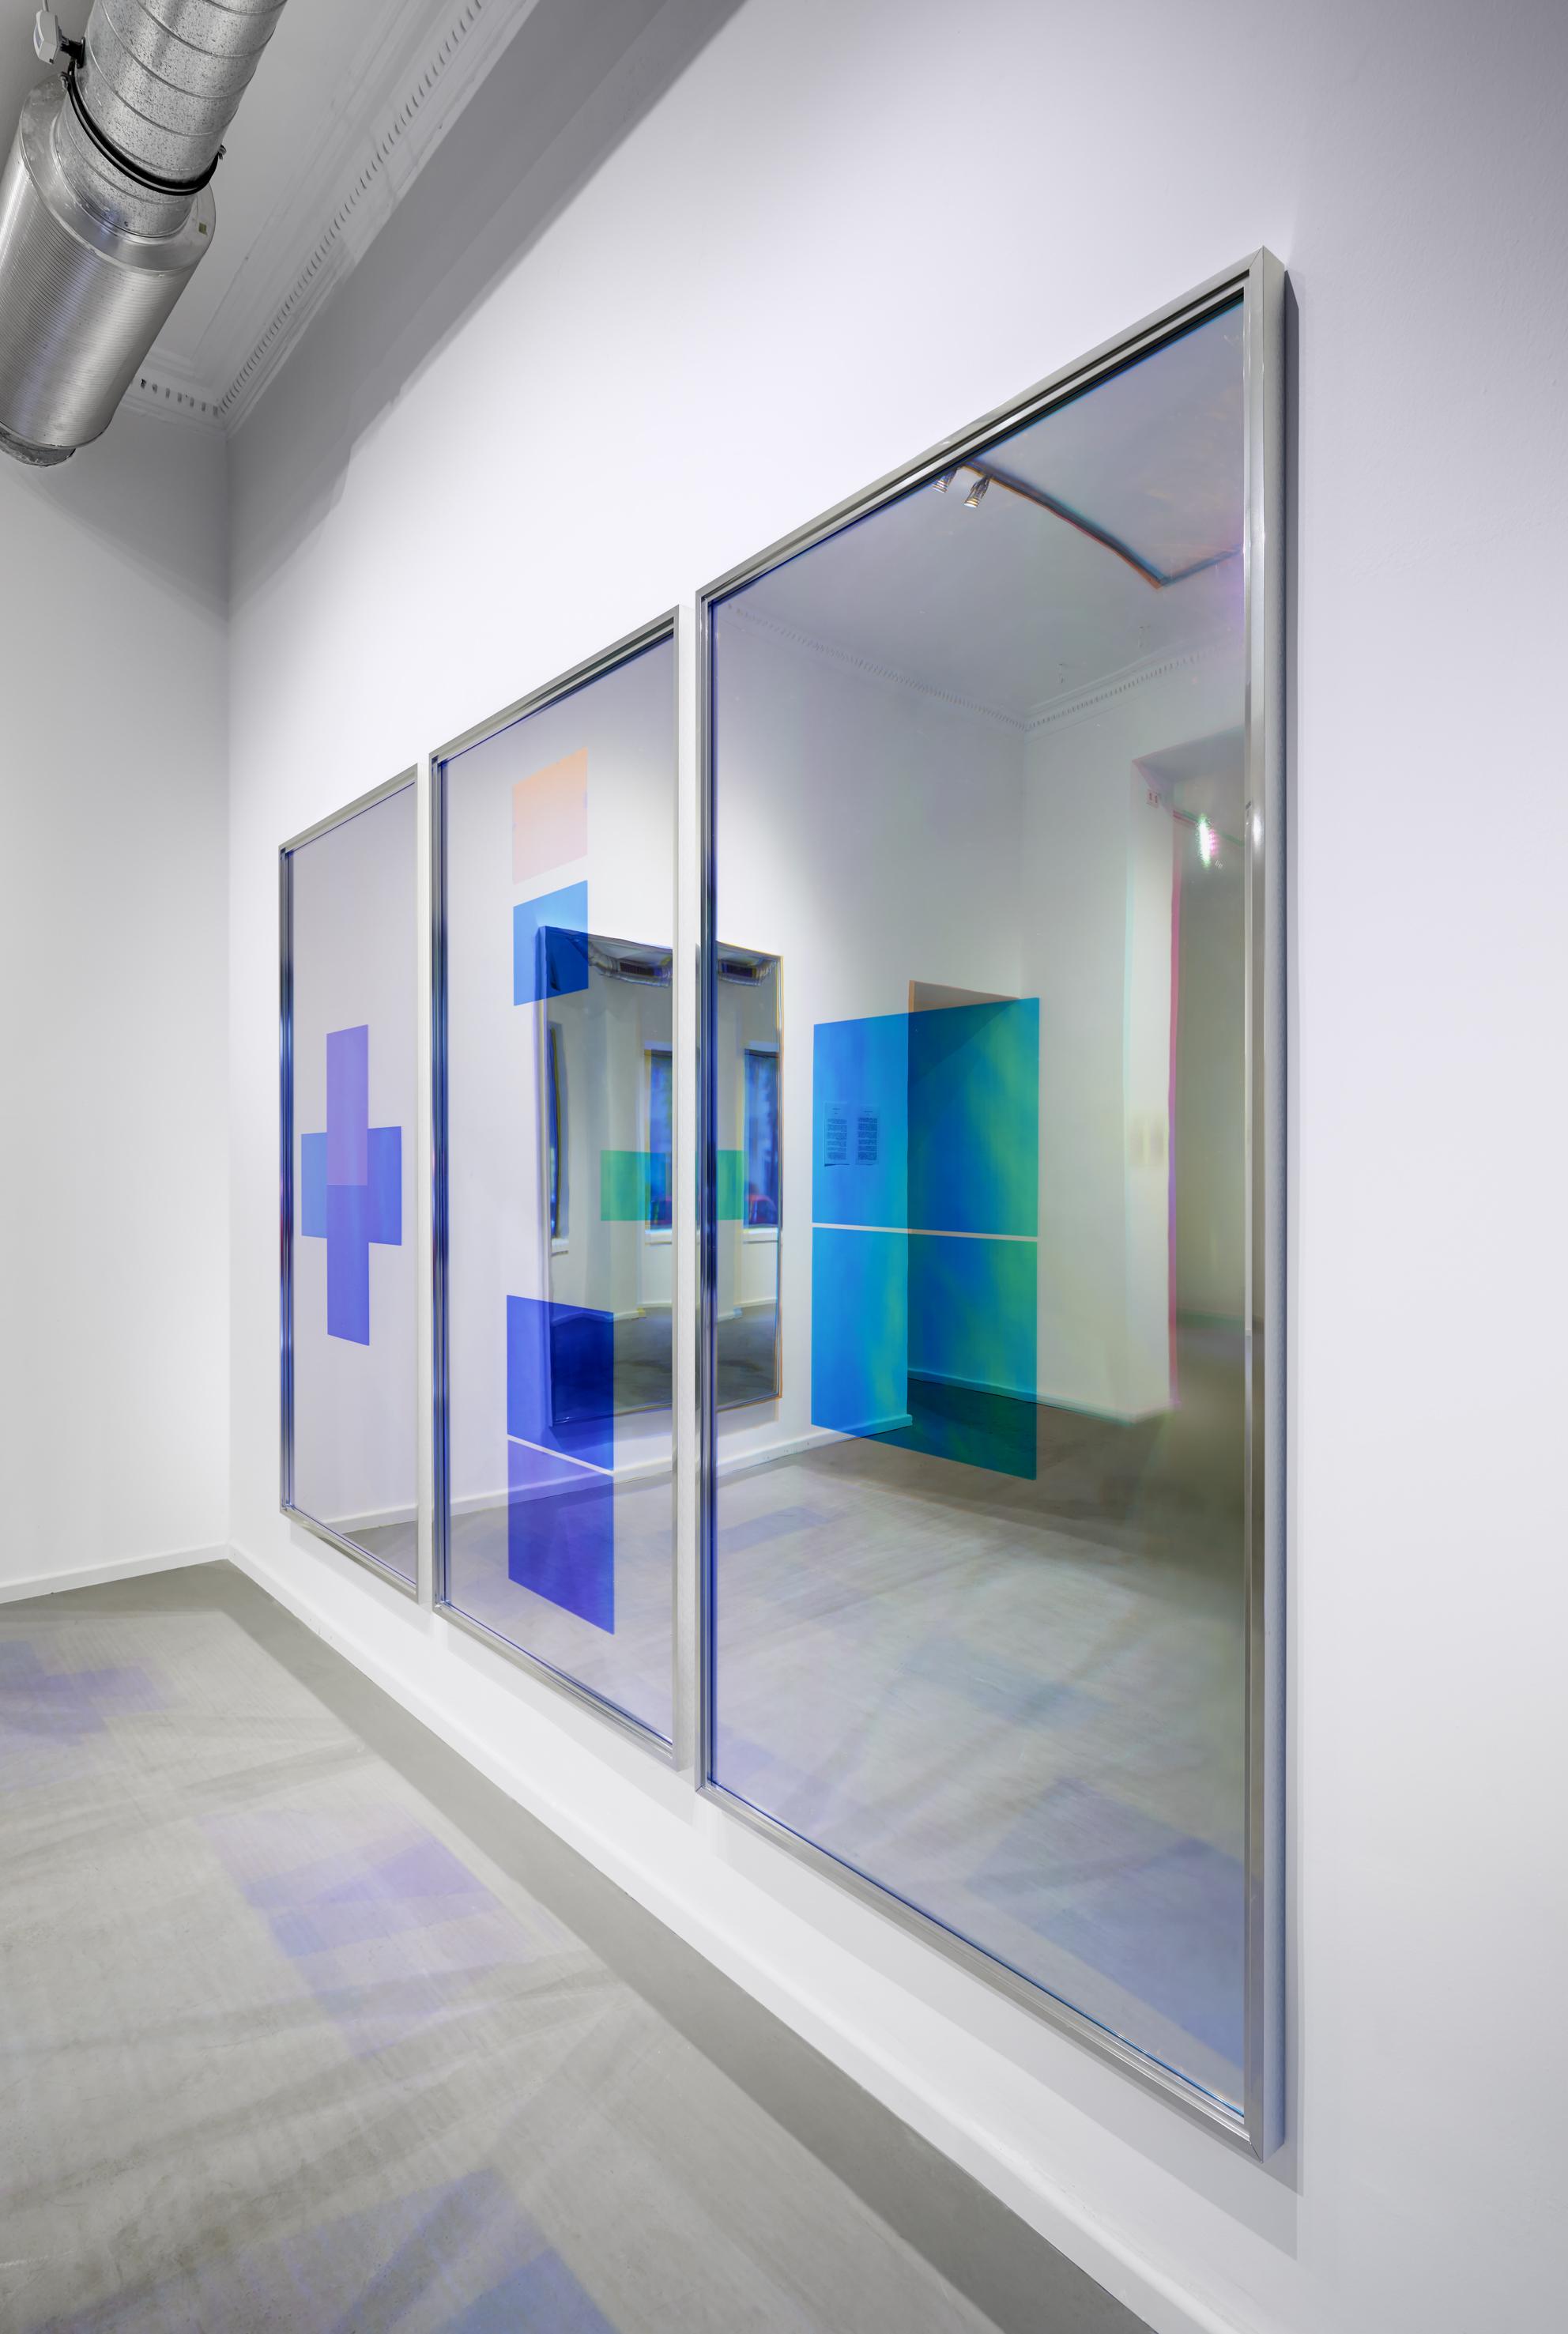 Spiegel im Spiegel / Part I, II, III, IV (Quadriptych),  2014 - Side view Acrylic foil on mirror beneath Radiant Plexiglas, aluminium frame structure 400 x 200 cm (157 x 79 in)